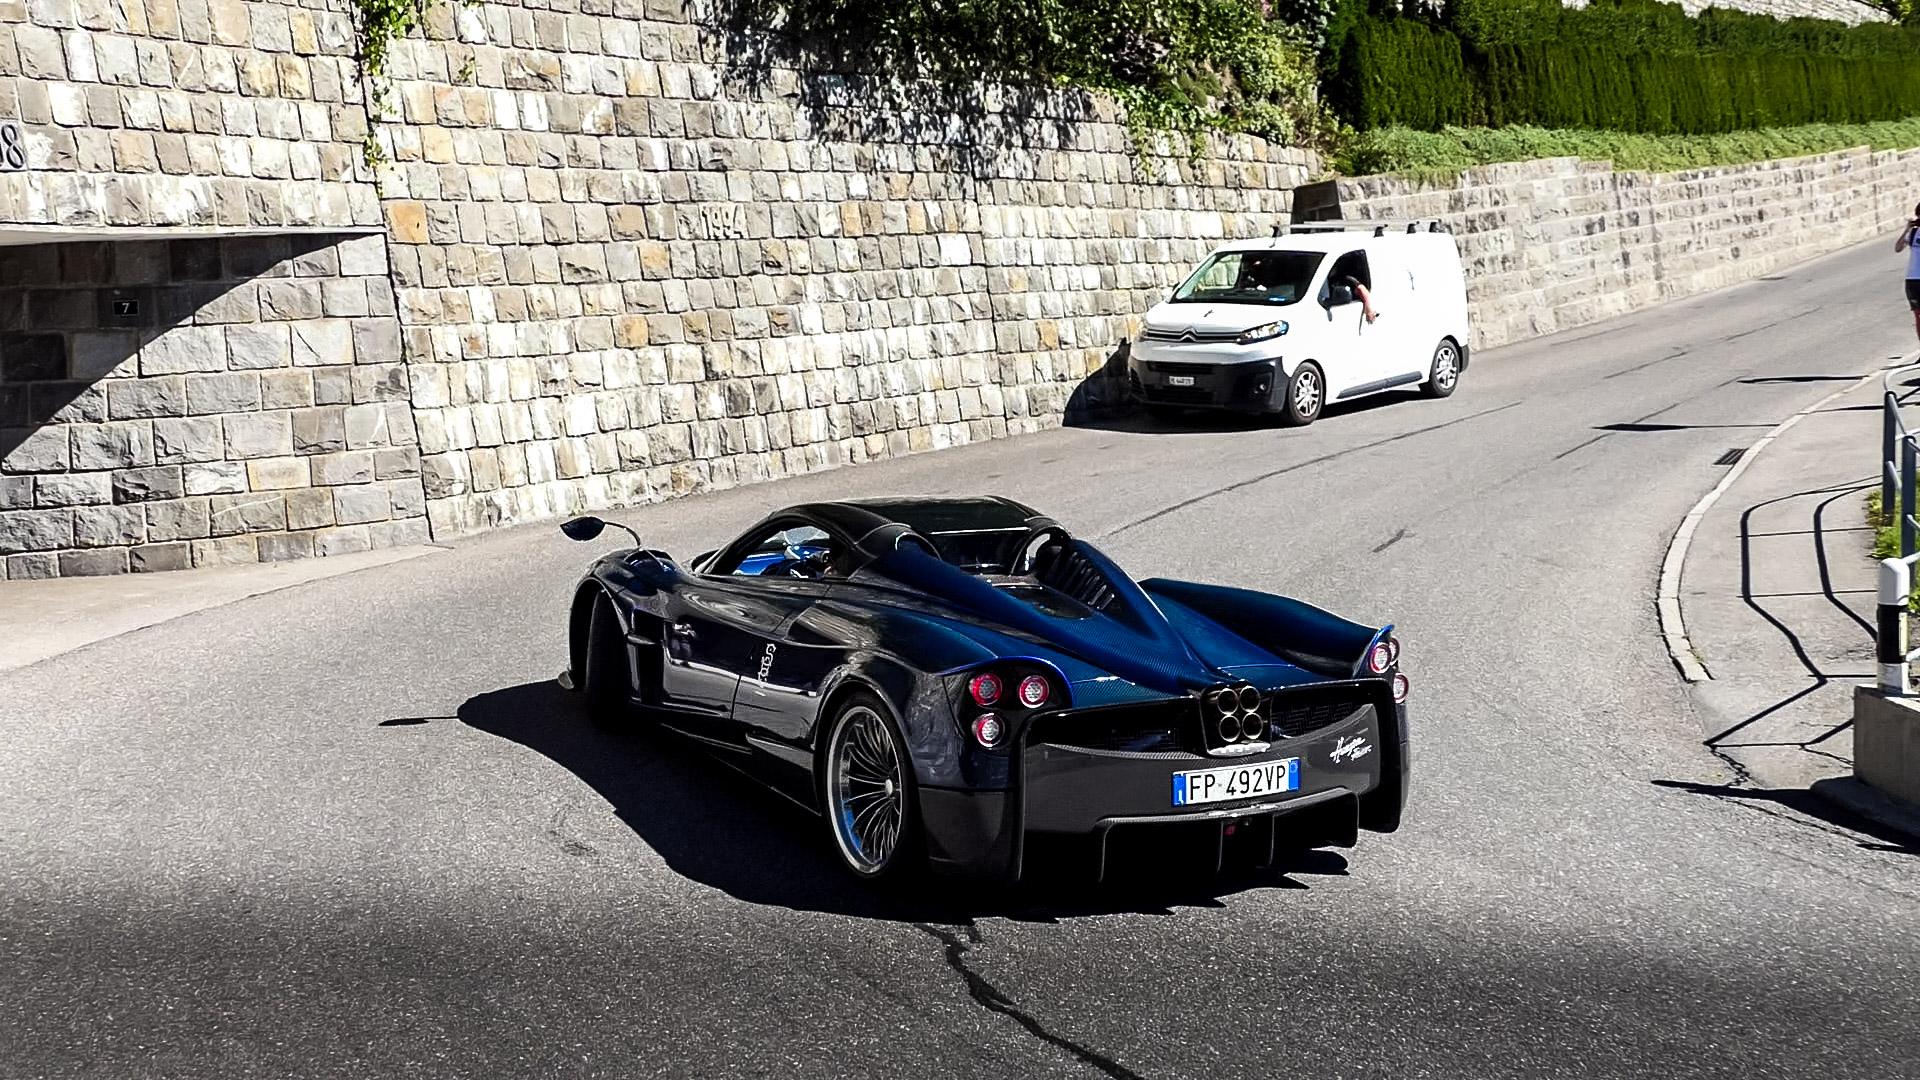 Pagani Huayra Roadster - FP-492-VP (ITA)